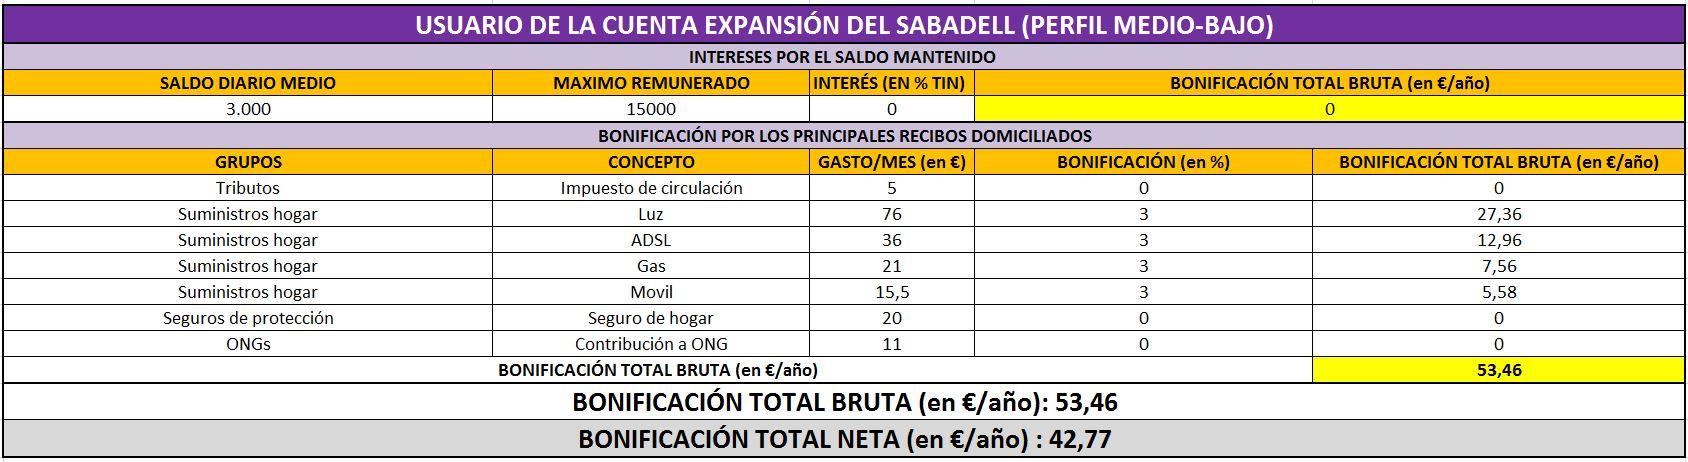 Sabadell%20perfil%20medio%20bajo